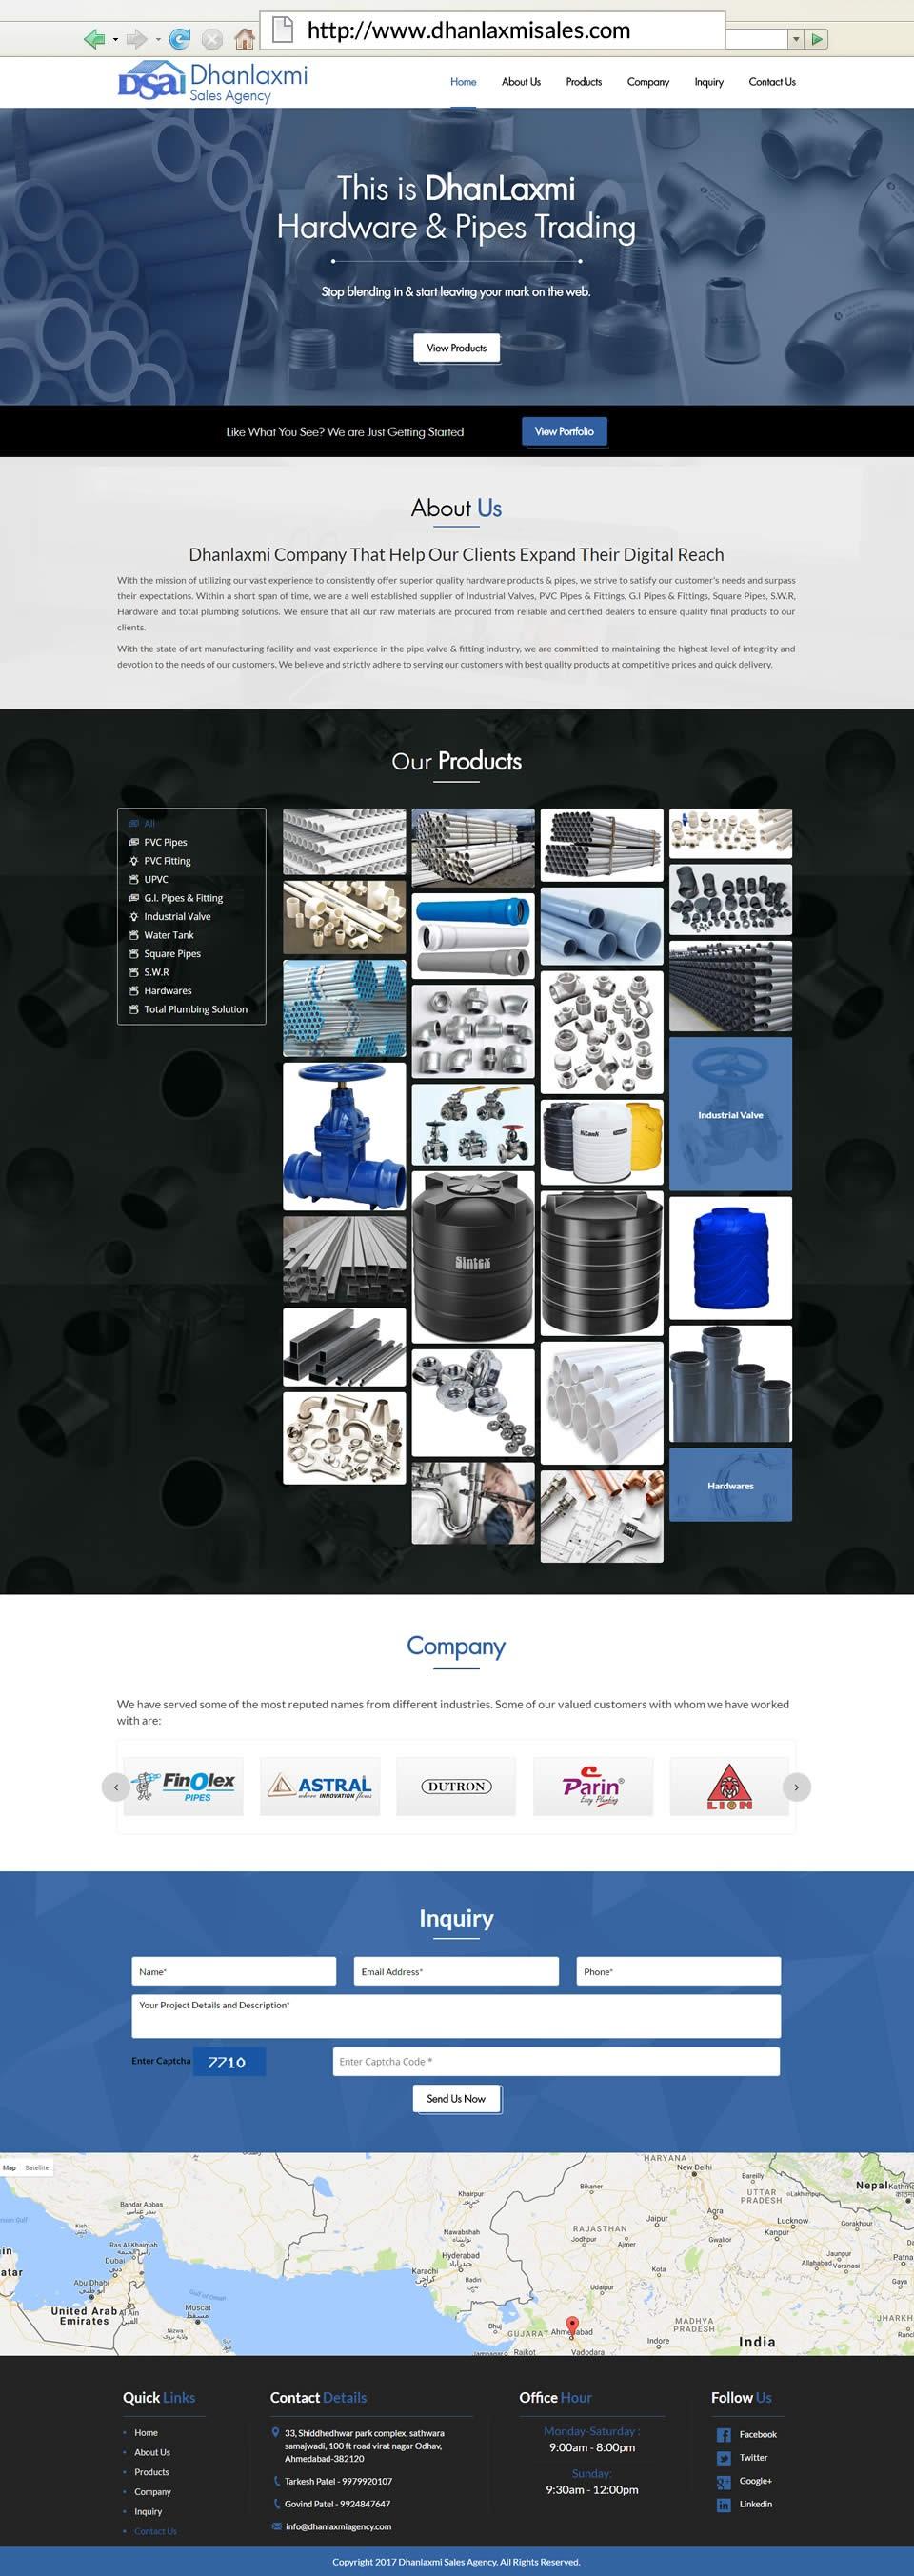 http://www.smartinfosys.net/50150/dhanlaxmi-sales.jpg